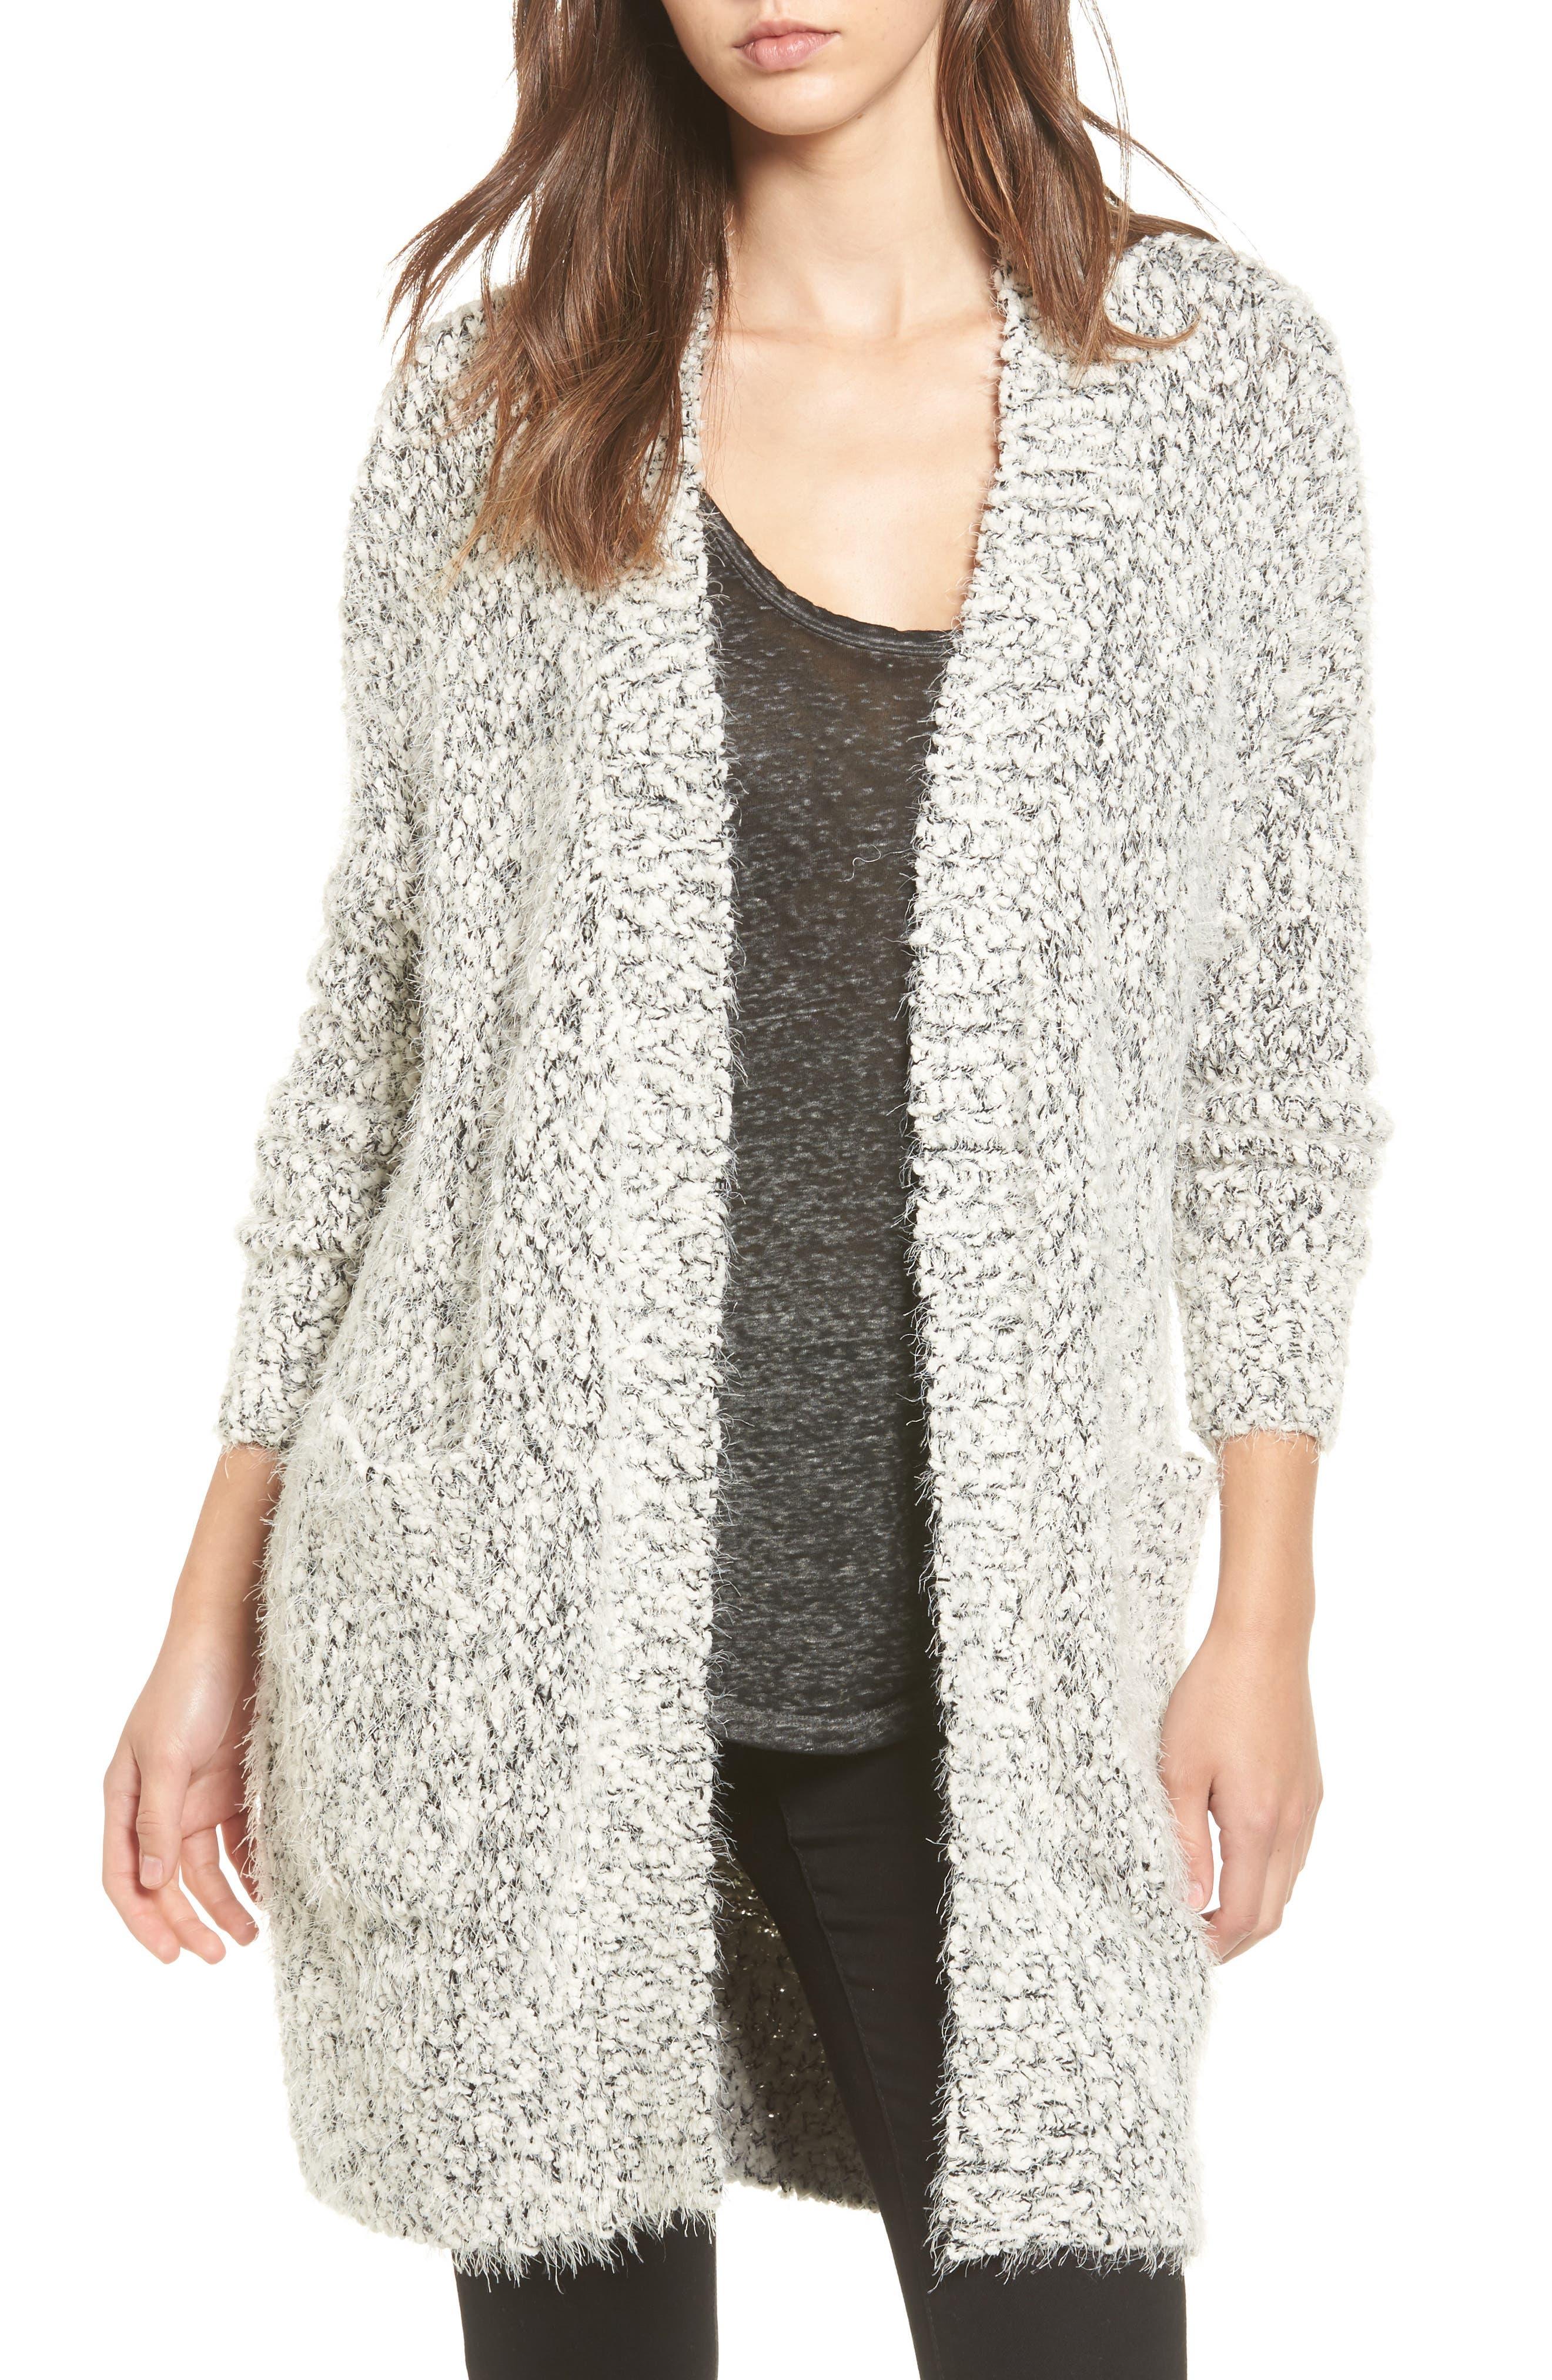 Main Image - Lira Clothing Miranda Knit Cardigan